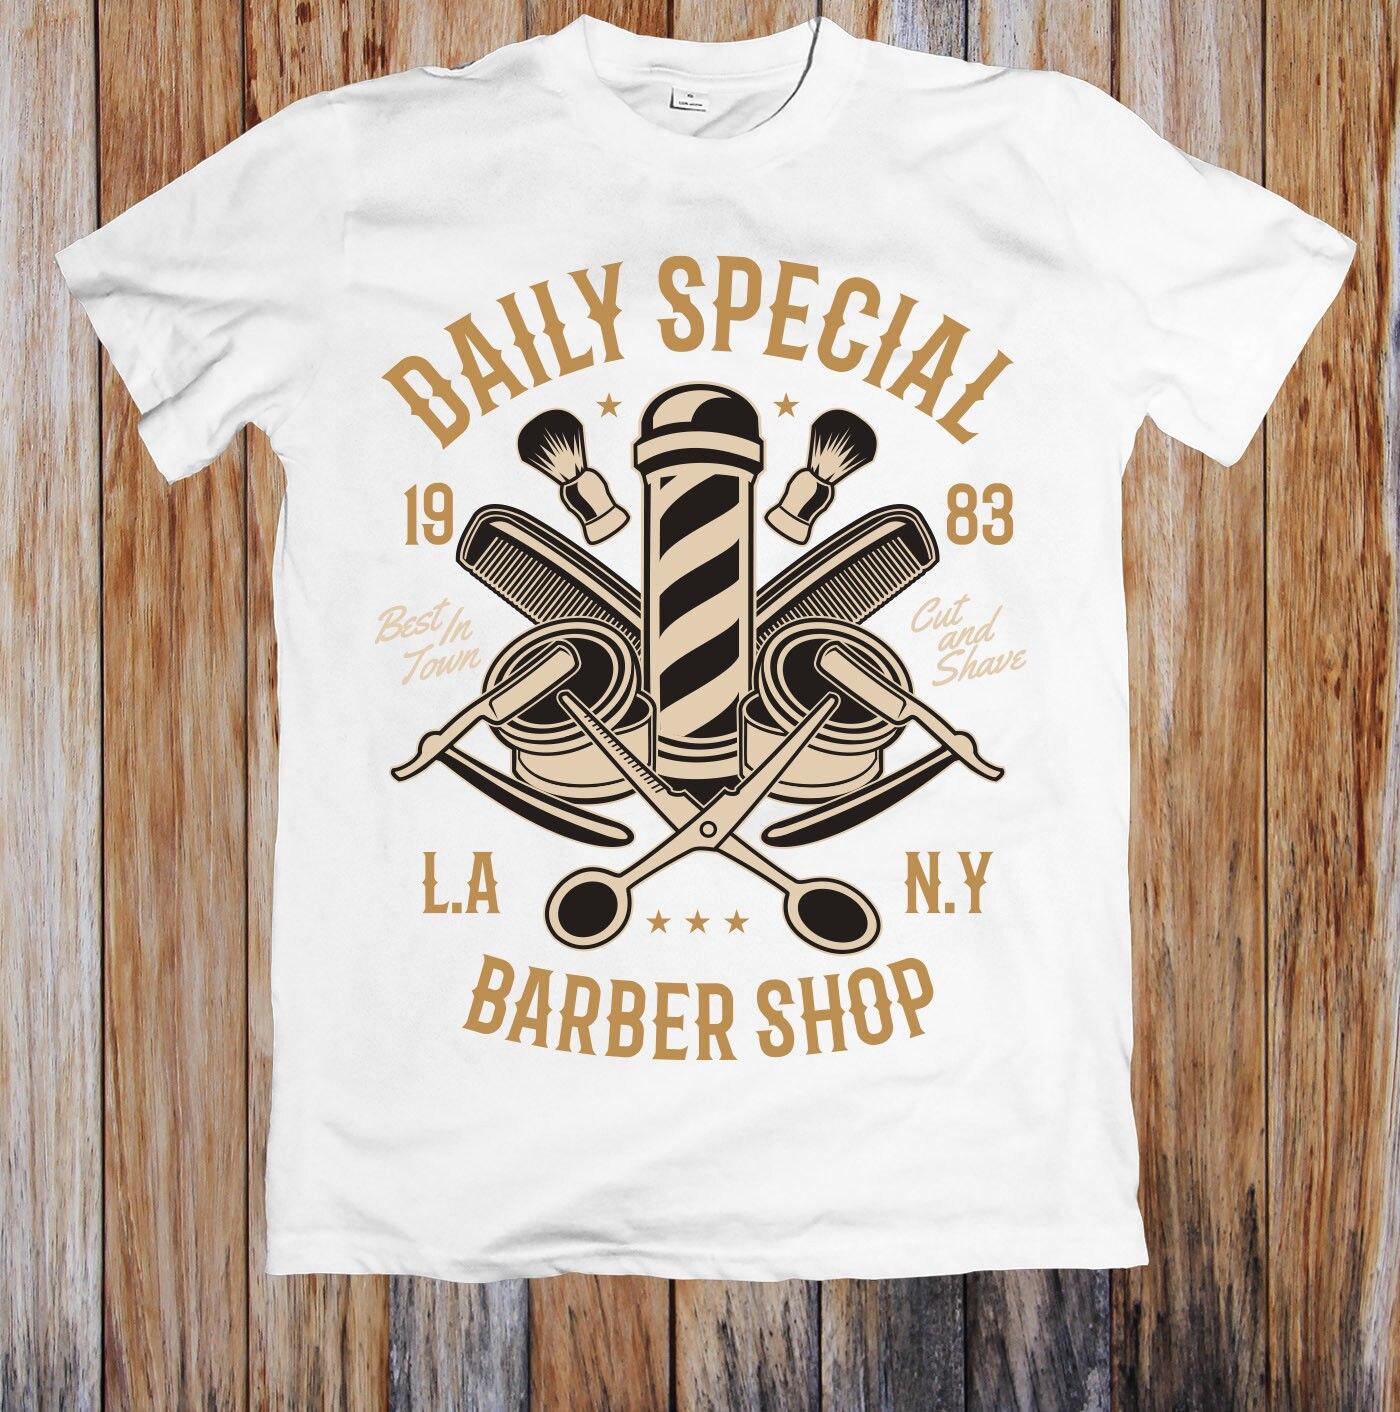 DAILY SPECIAL BARBER SHOP UNISEX T-SHIRT Cartoon Hip Hop Shirt